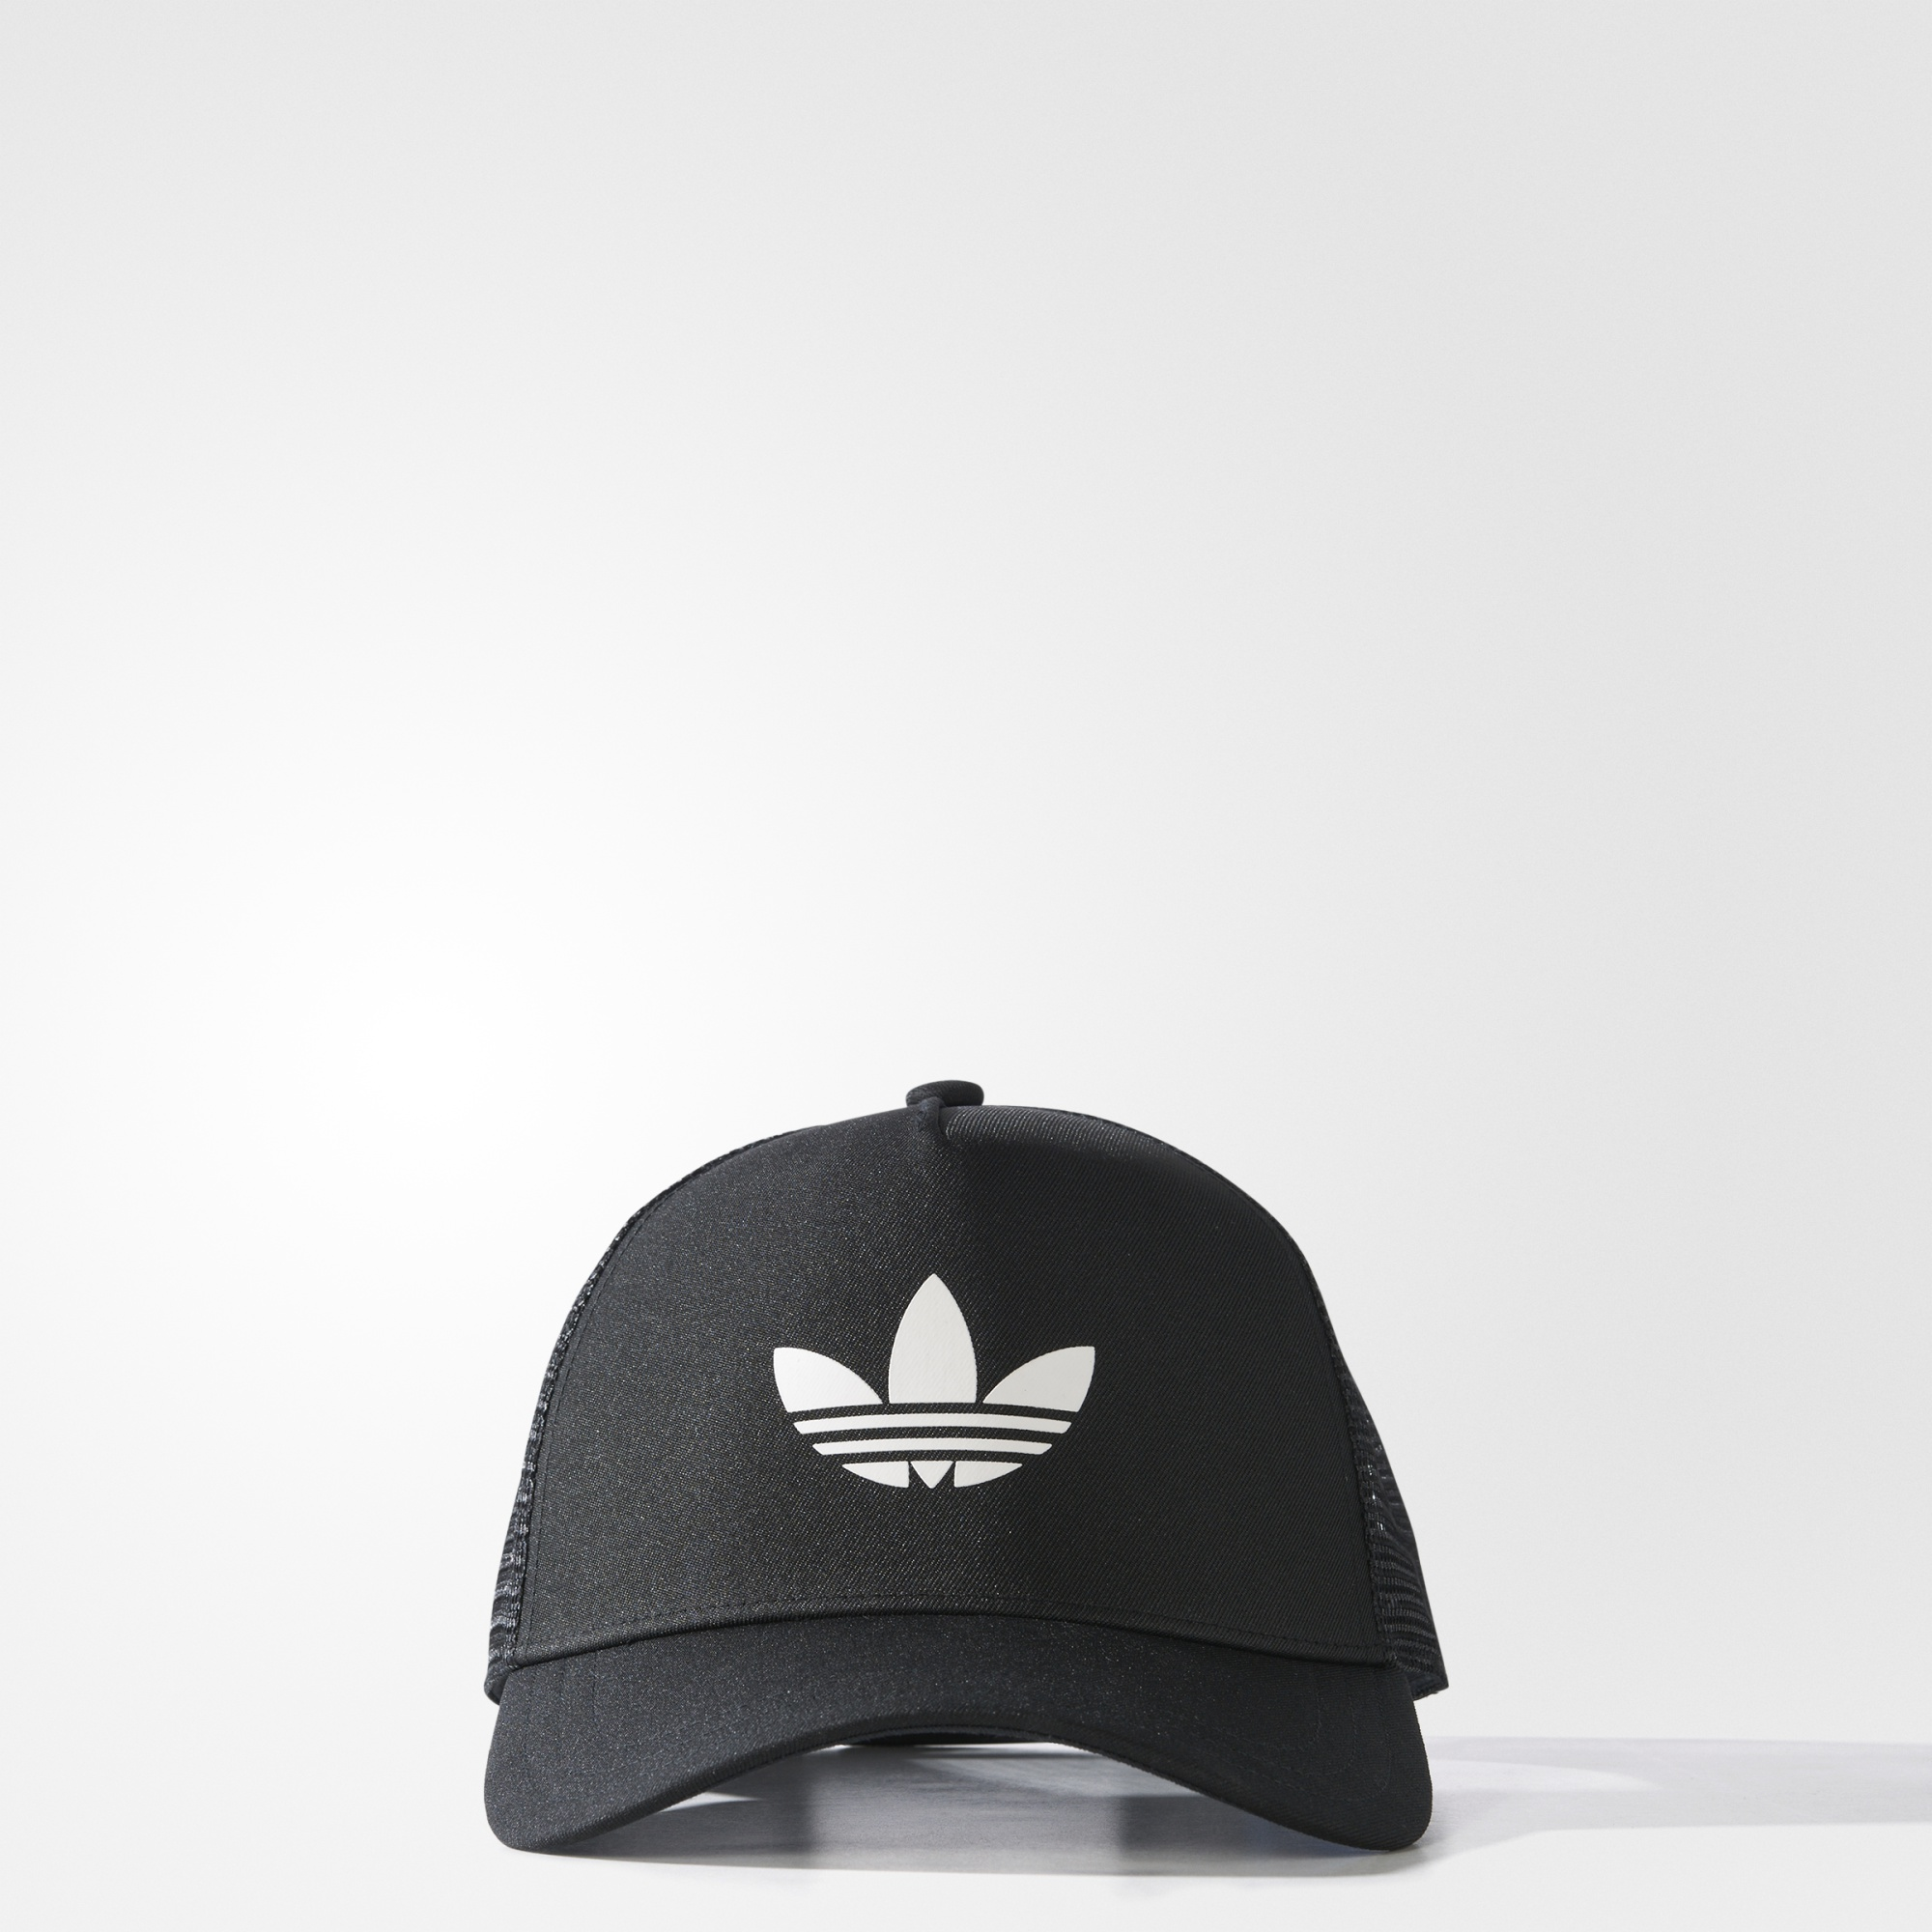 868416ab95040 adidas Trefoil Trucker Hat - Black